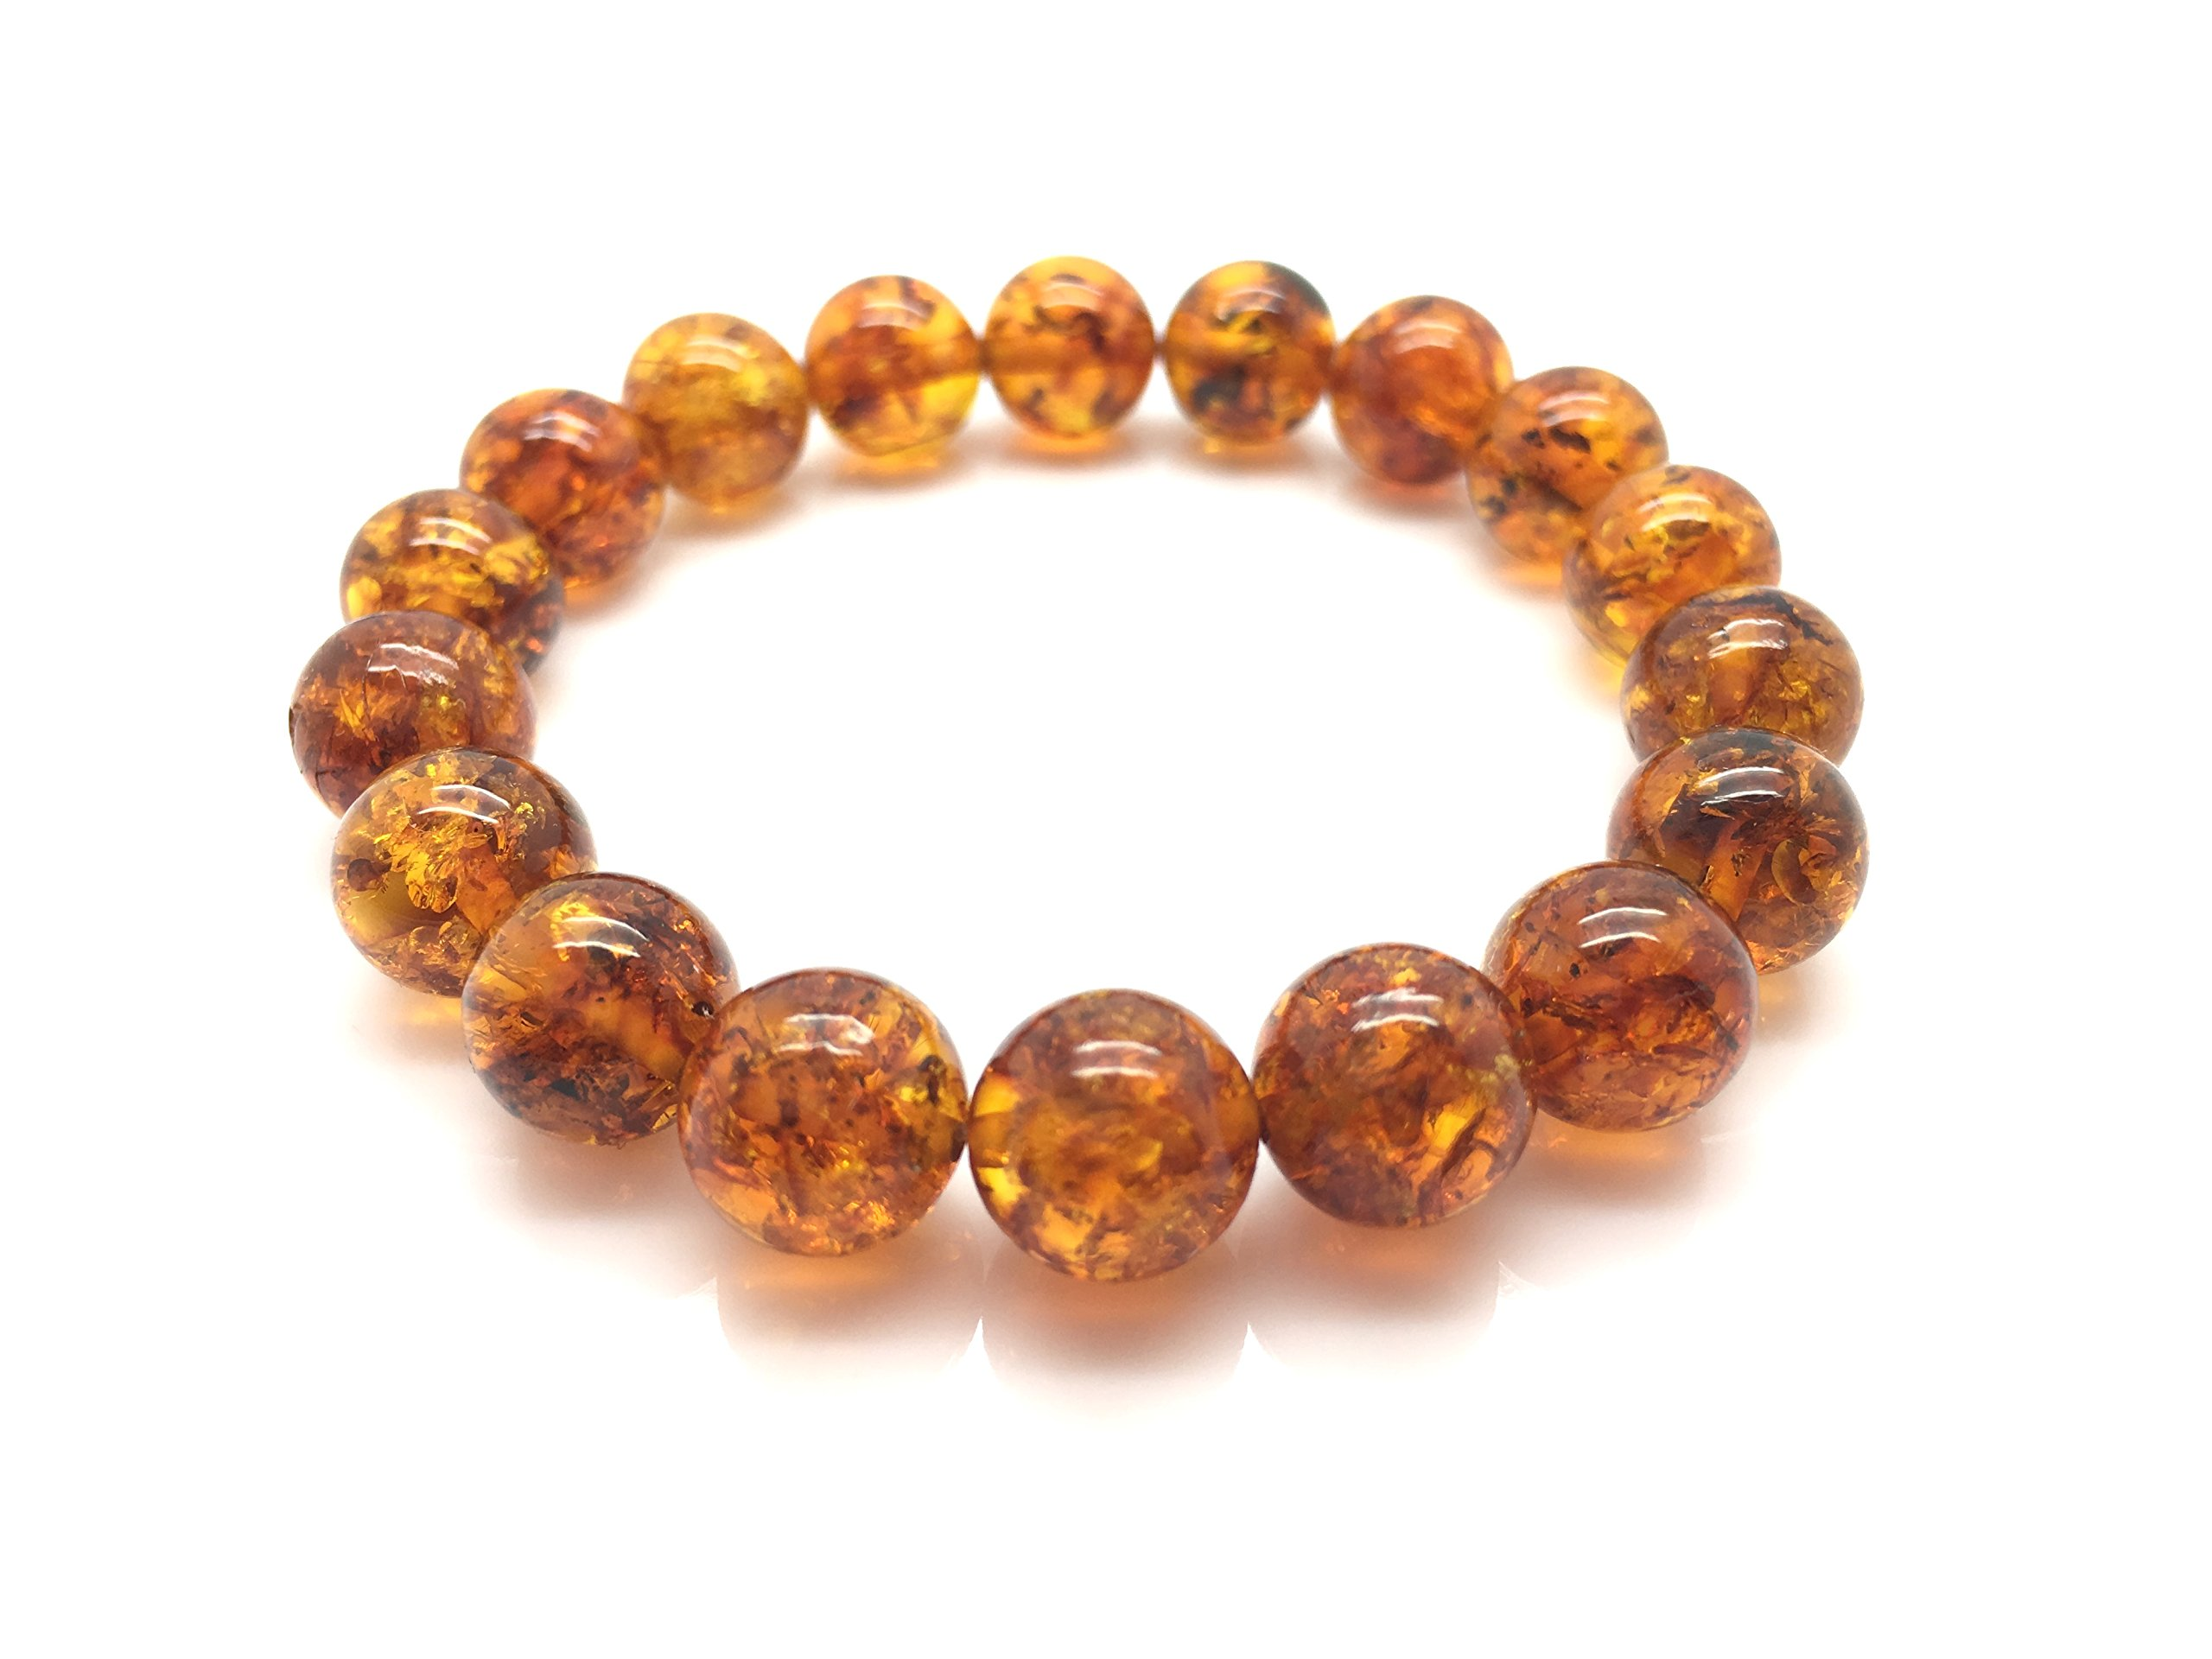 Natural Baltic Amber Bracelet Light Cognac Colour 10,6g 10± mm Size. by Mister Amber